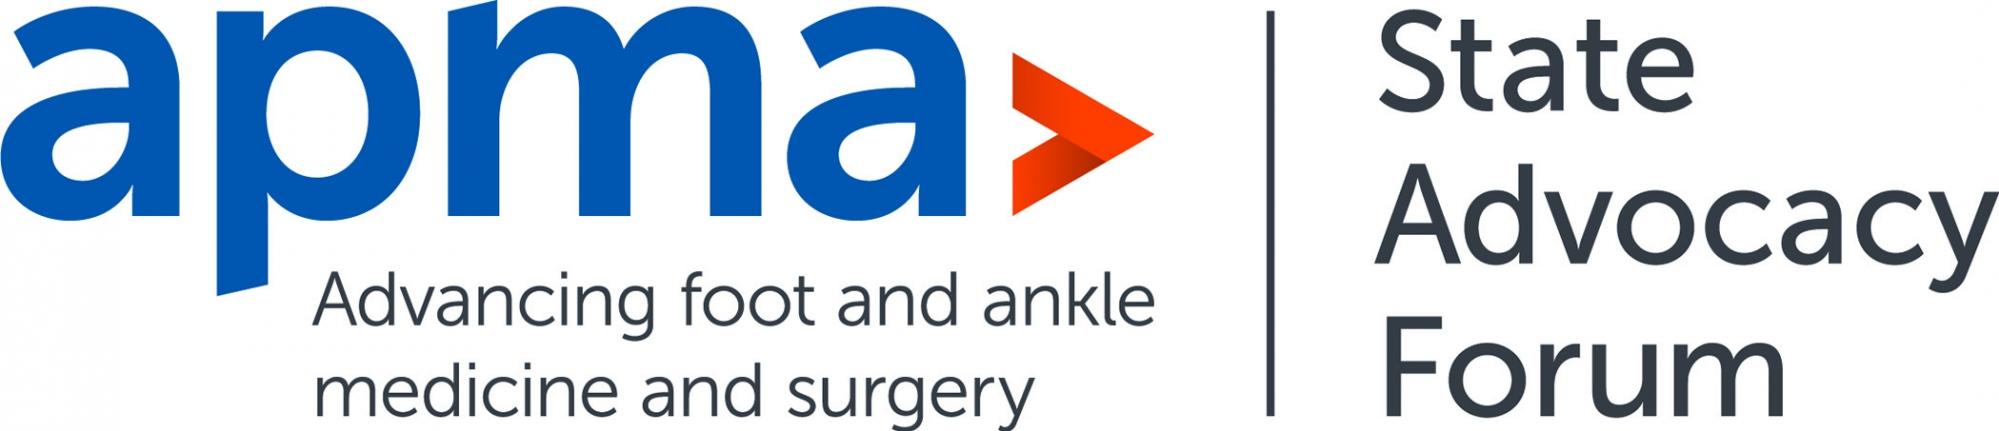 APMA State Advocacy Forum logo